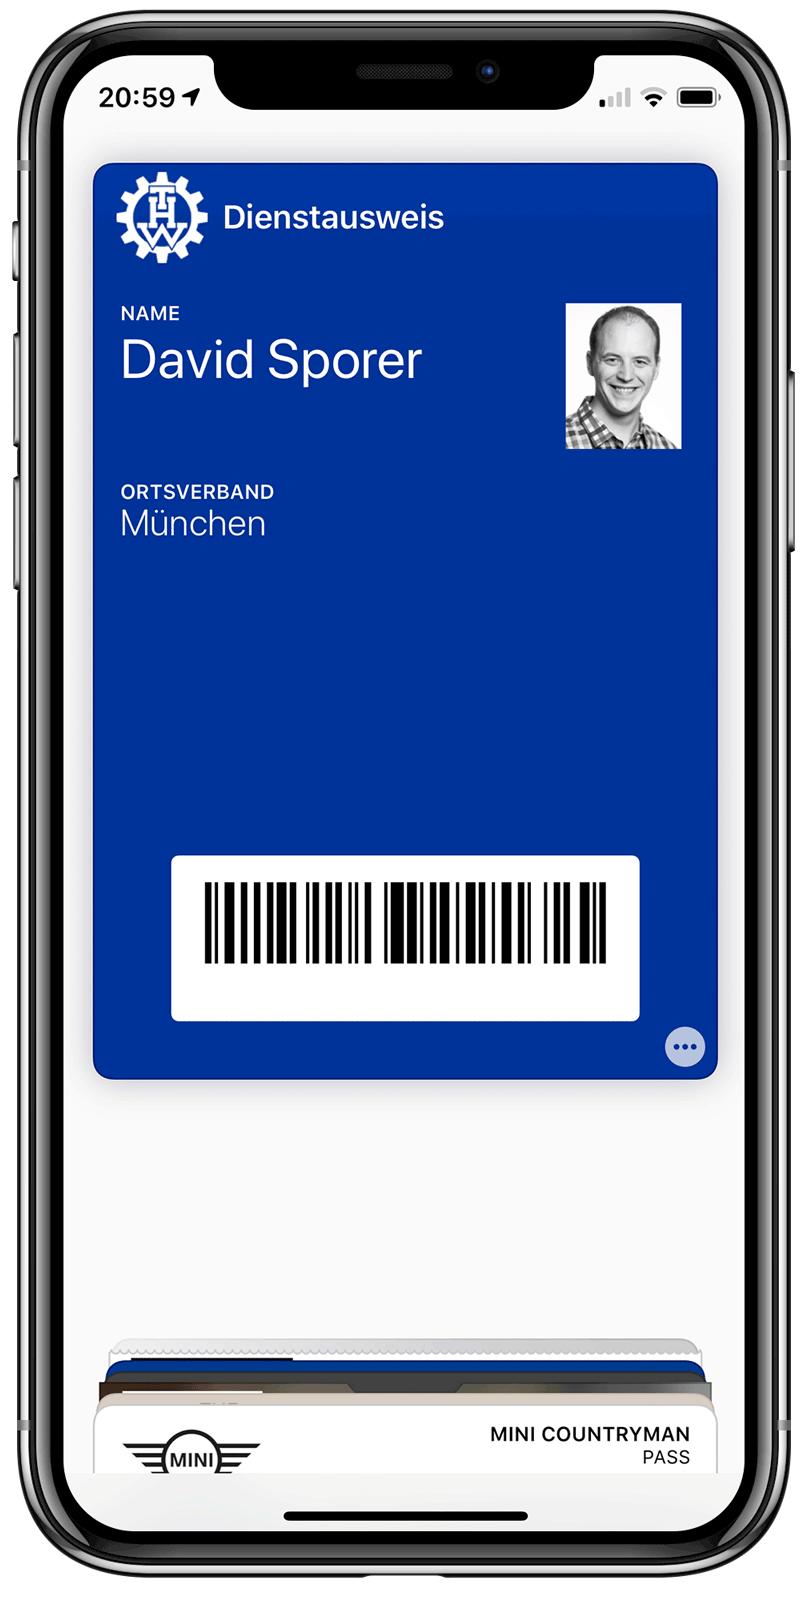 thw-membership-card